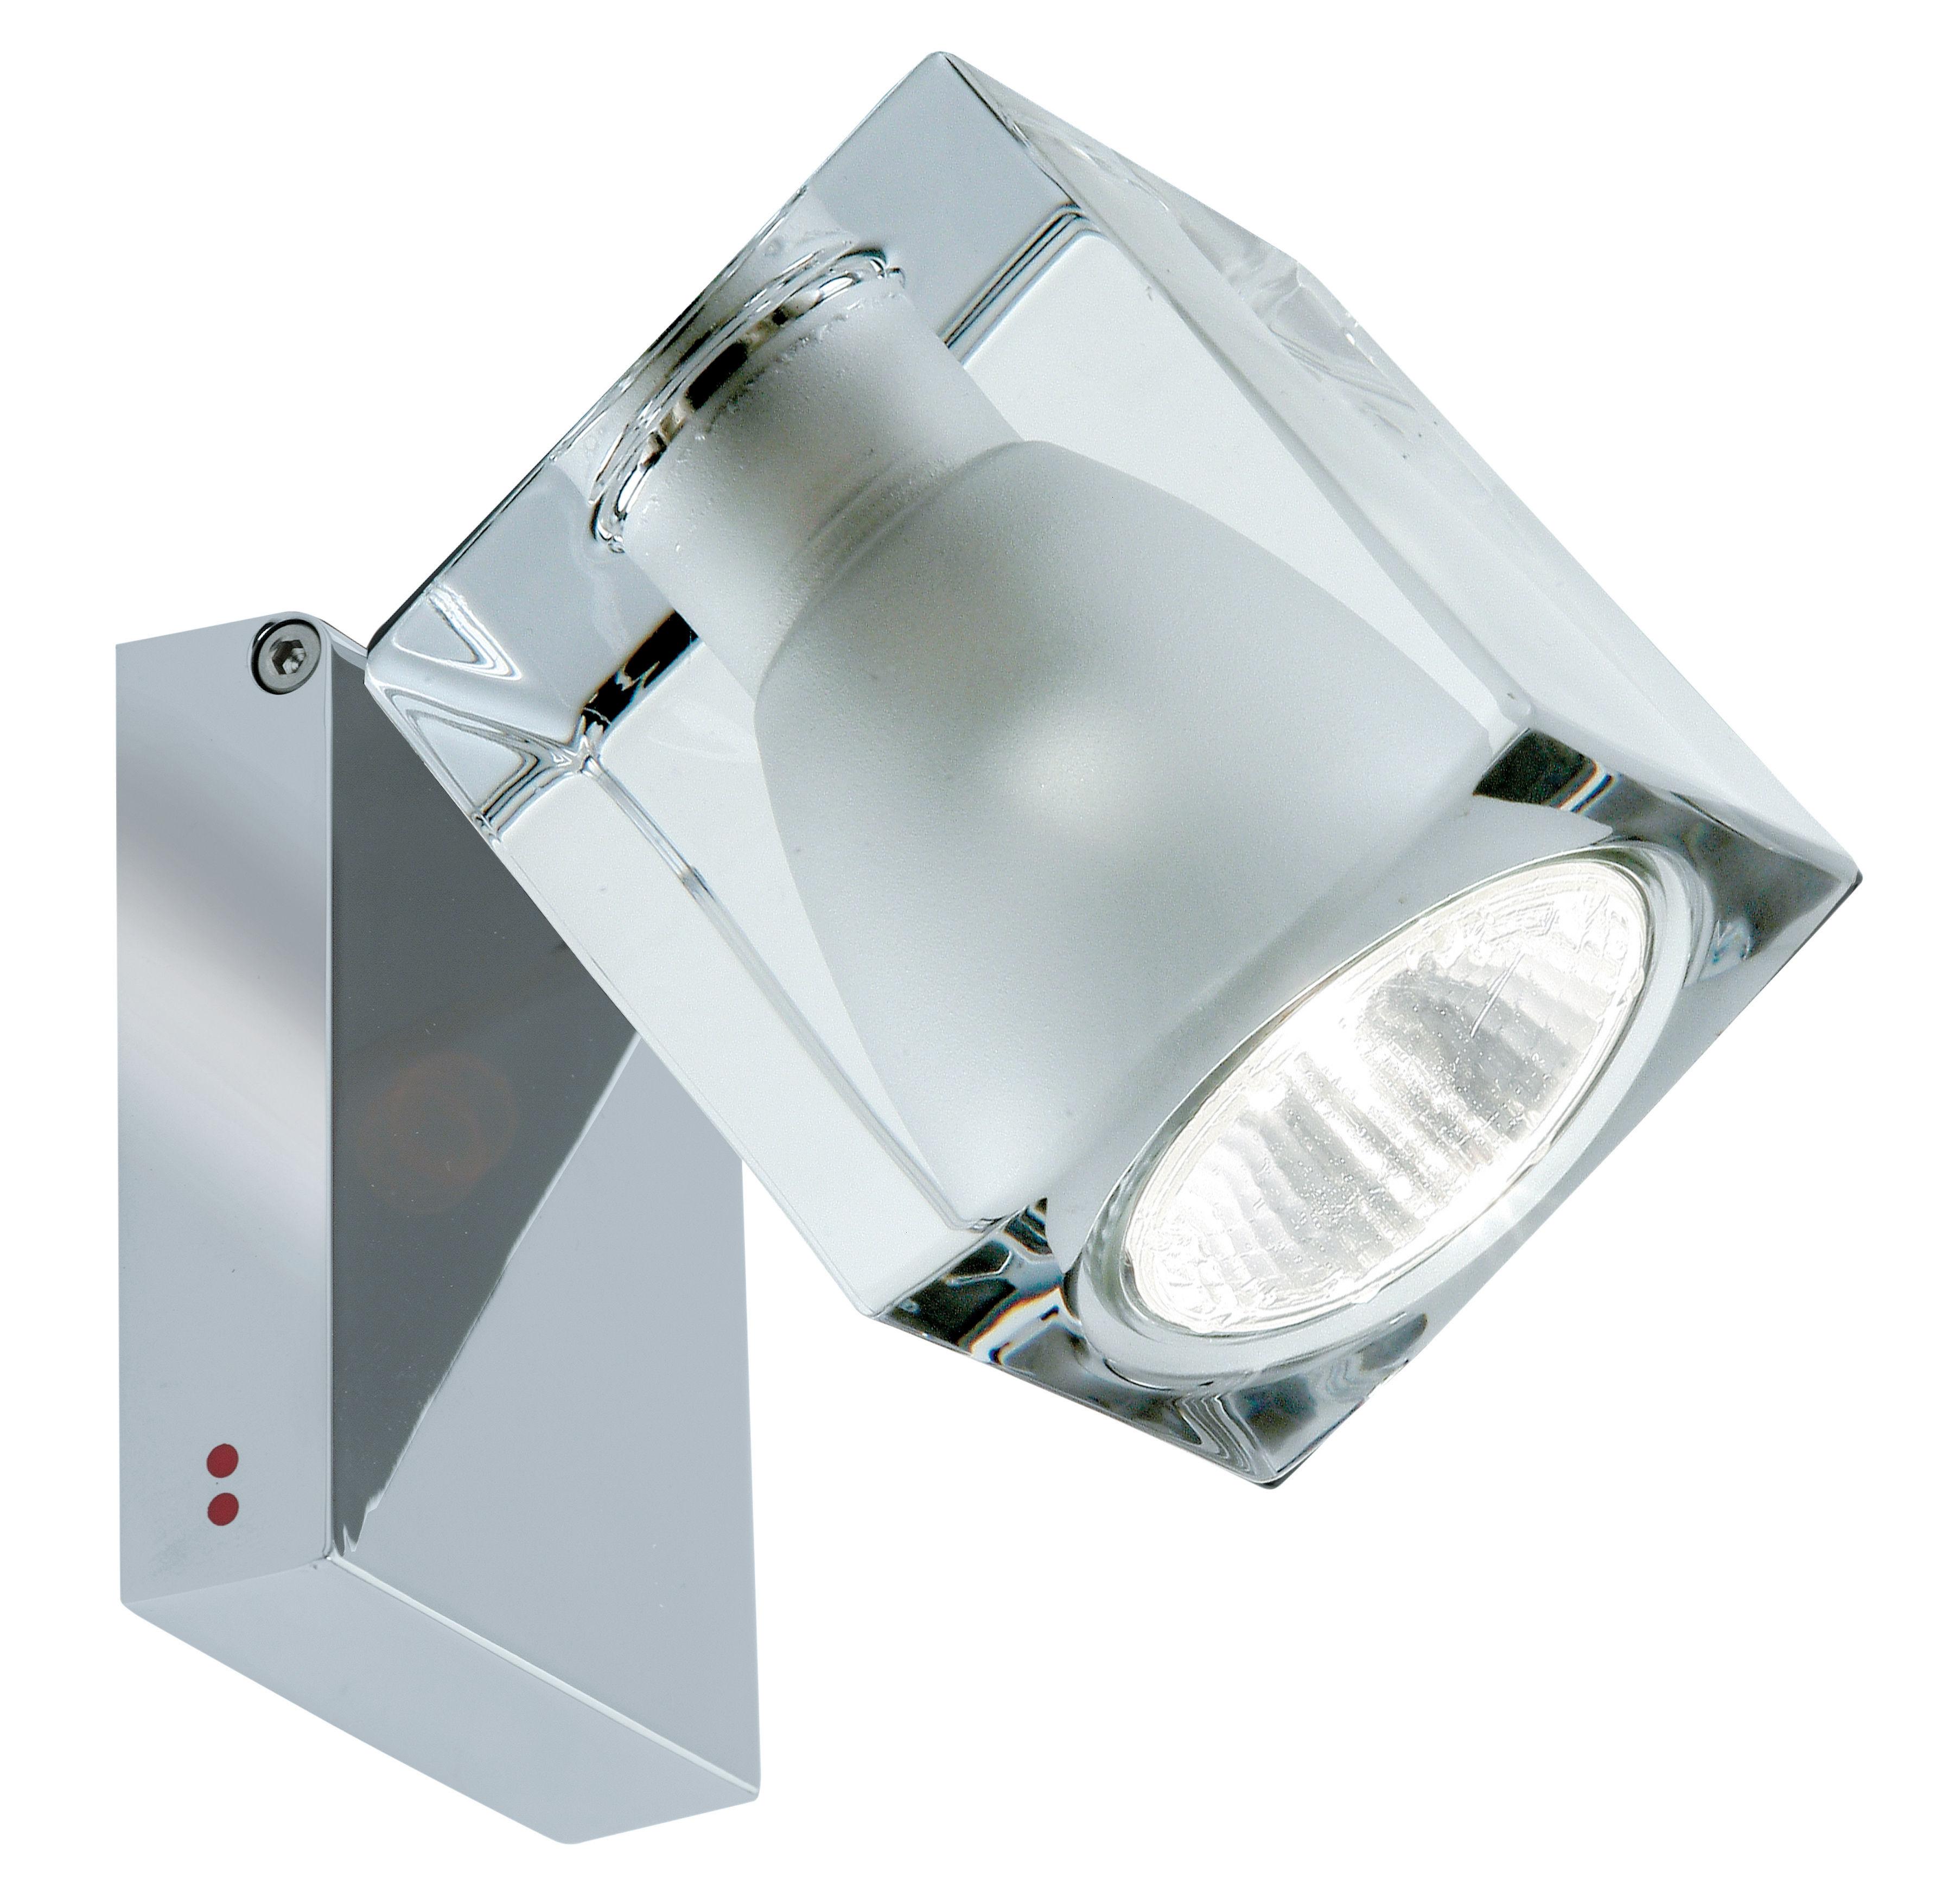 Leuchten - Wandleuchten - Cubetto  Crystal Wandleuchte / Deckenleuchte - verstellbar - Fabbian - Transparent / Wandhalterung chrom-glänzend - Glas, verchromtes Metall